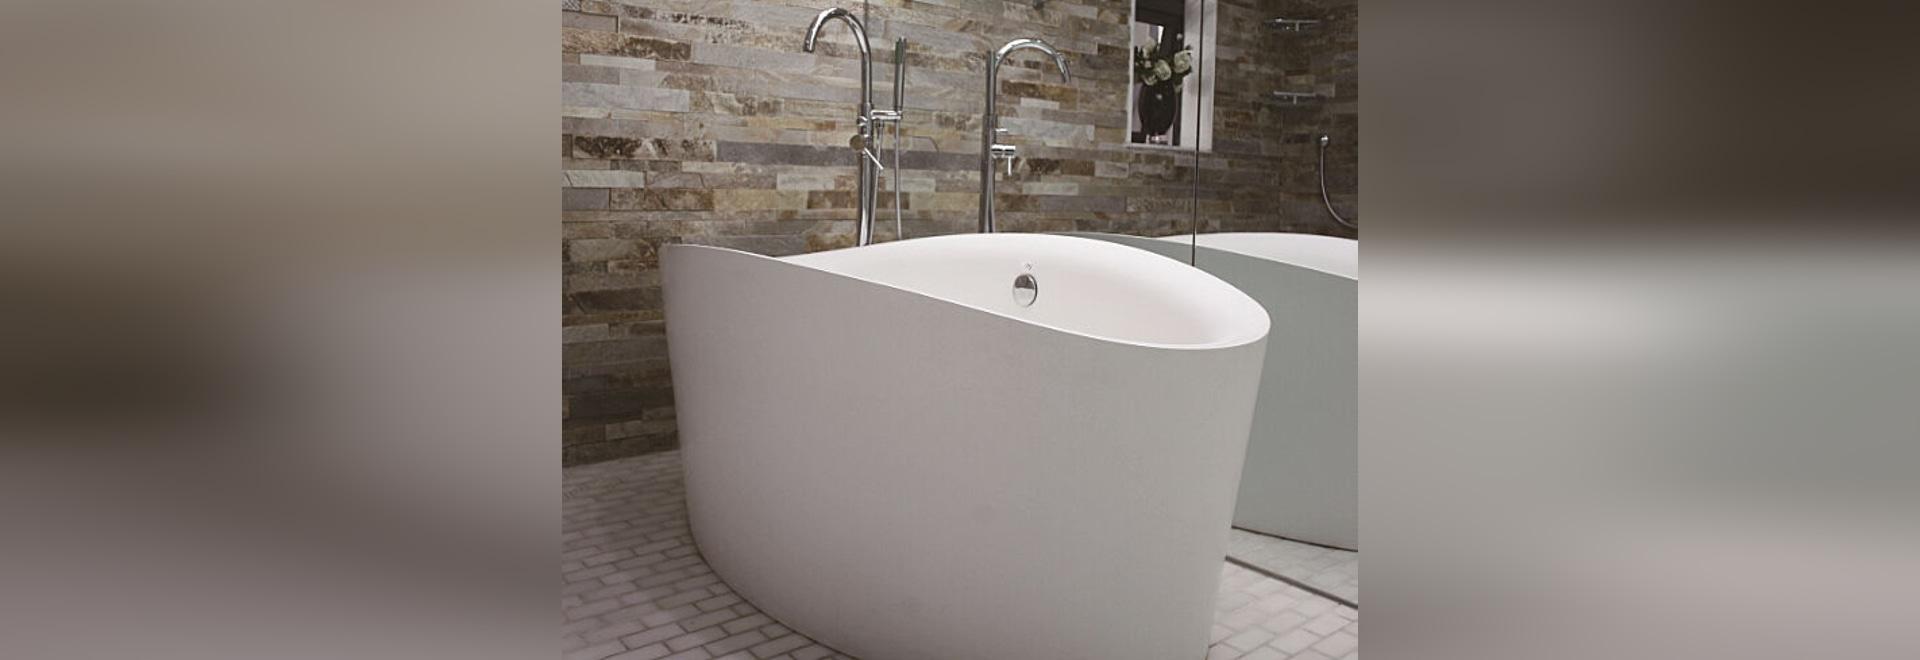 Resin stone bathtub PG11586 by PG